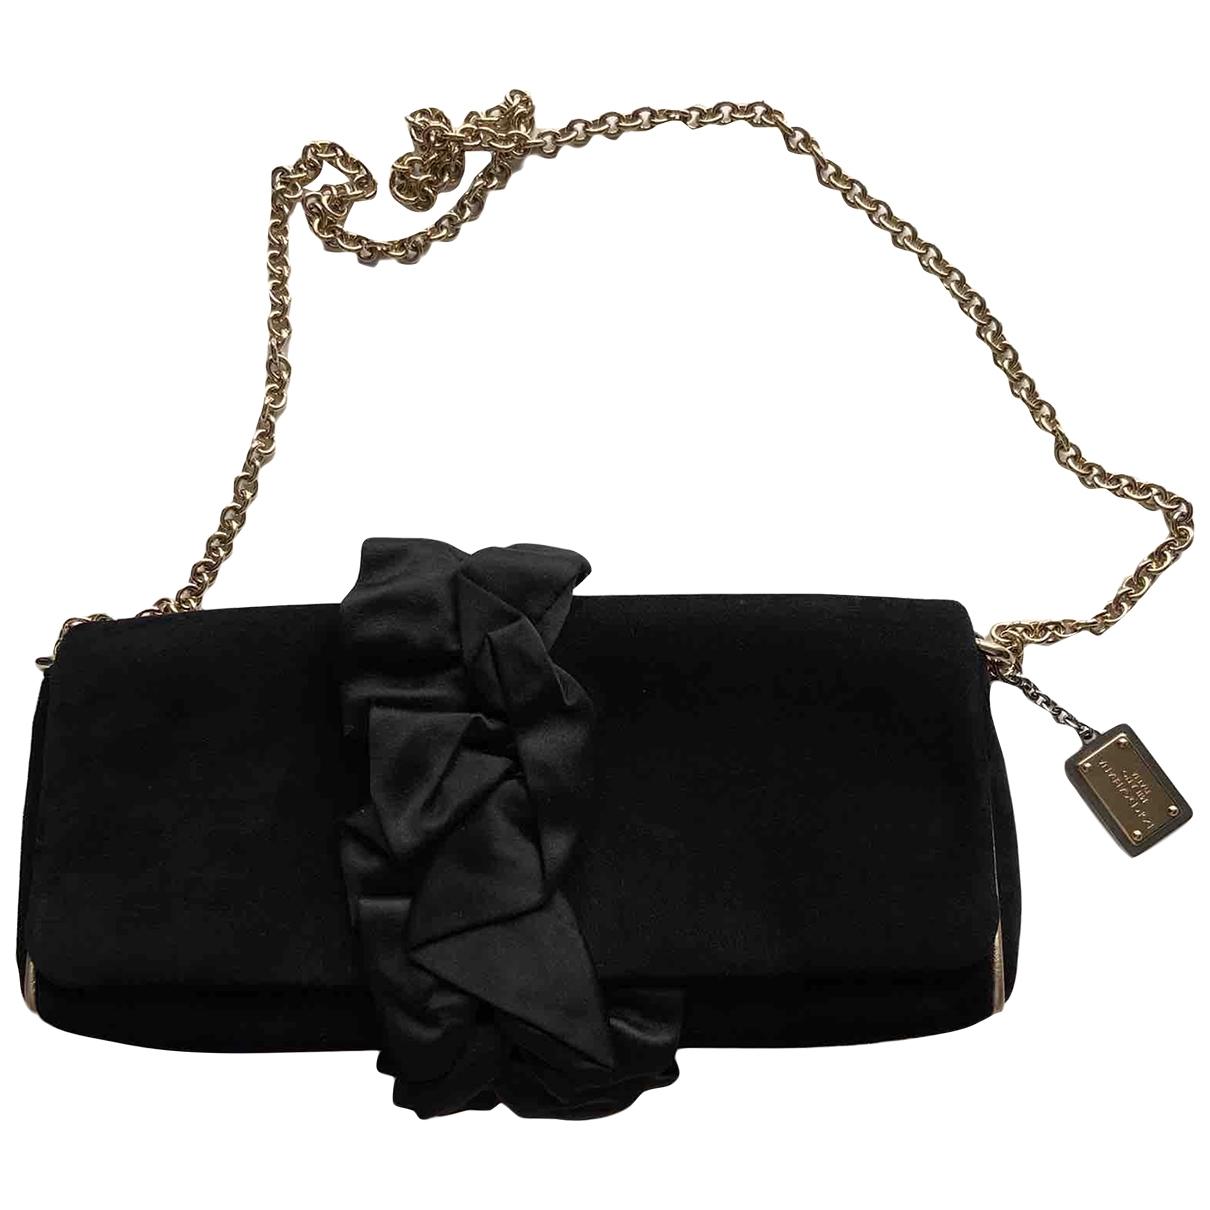 Dolce & Gabbana \N Black Suede handbag for Women \N